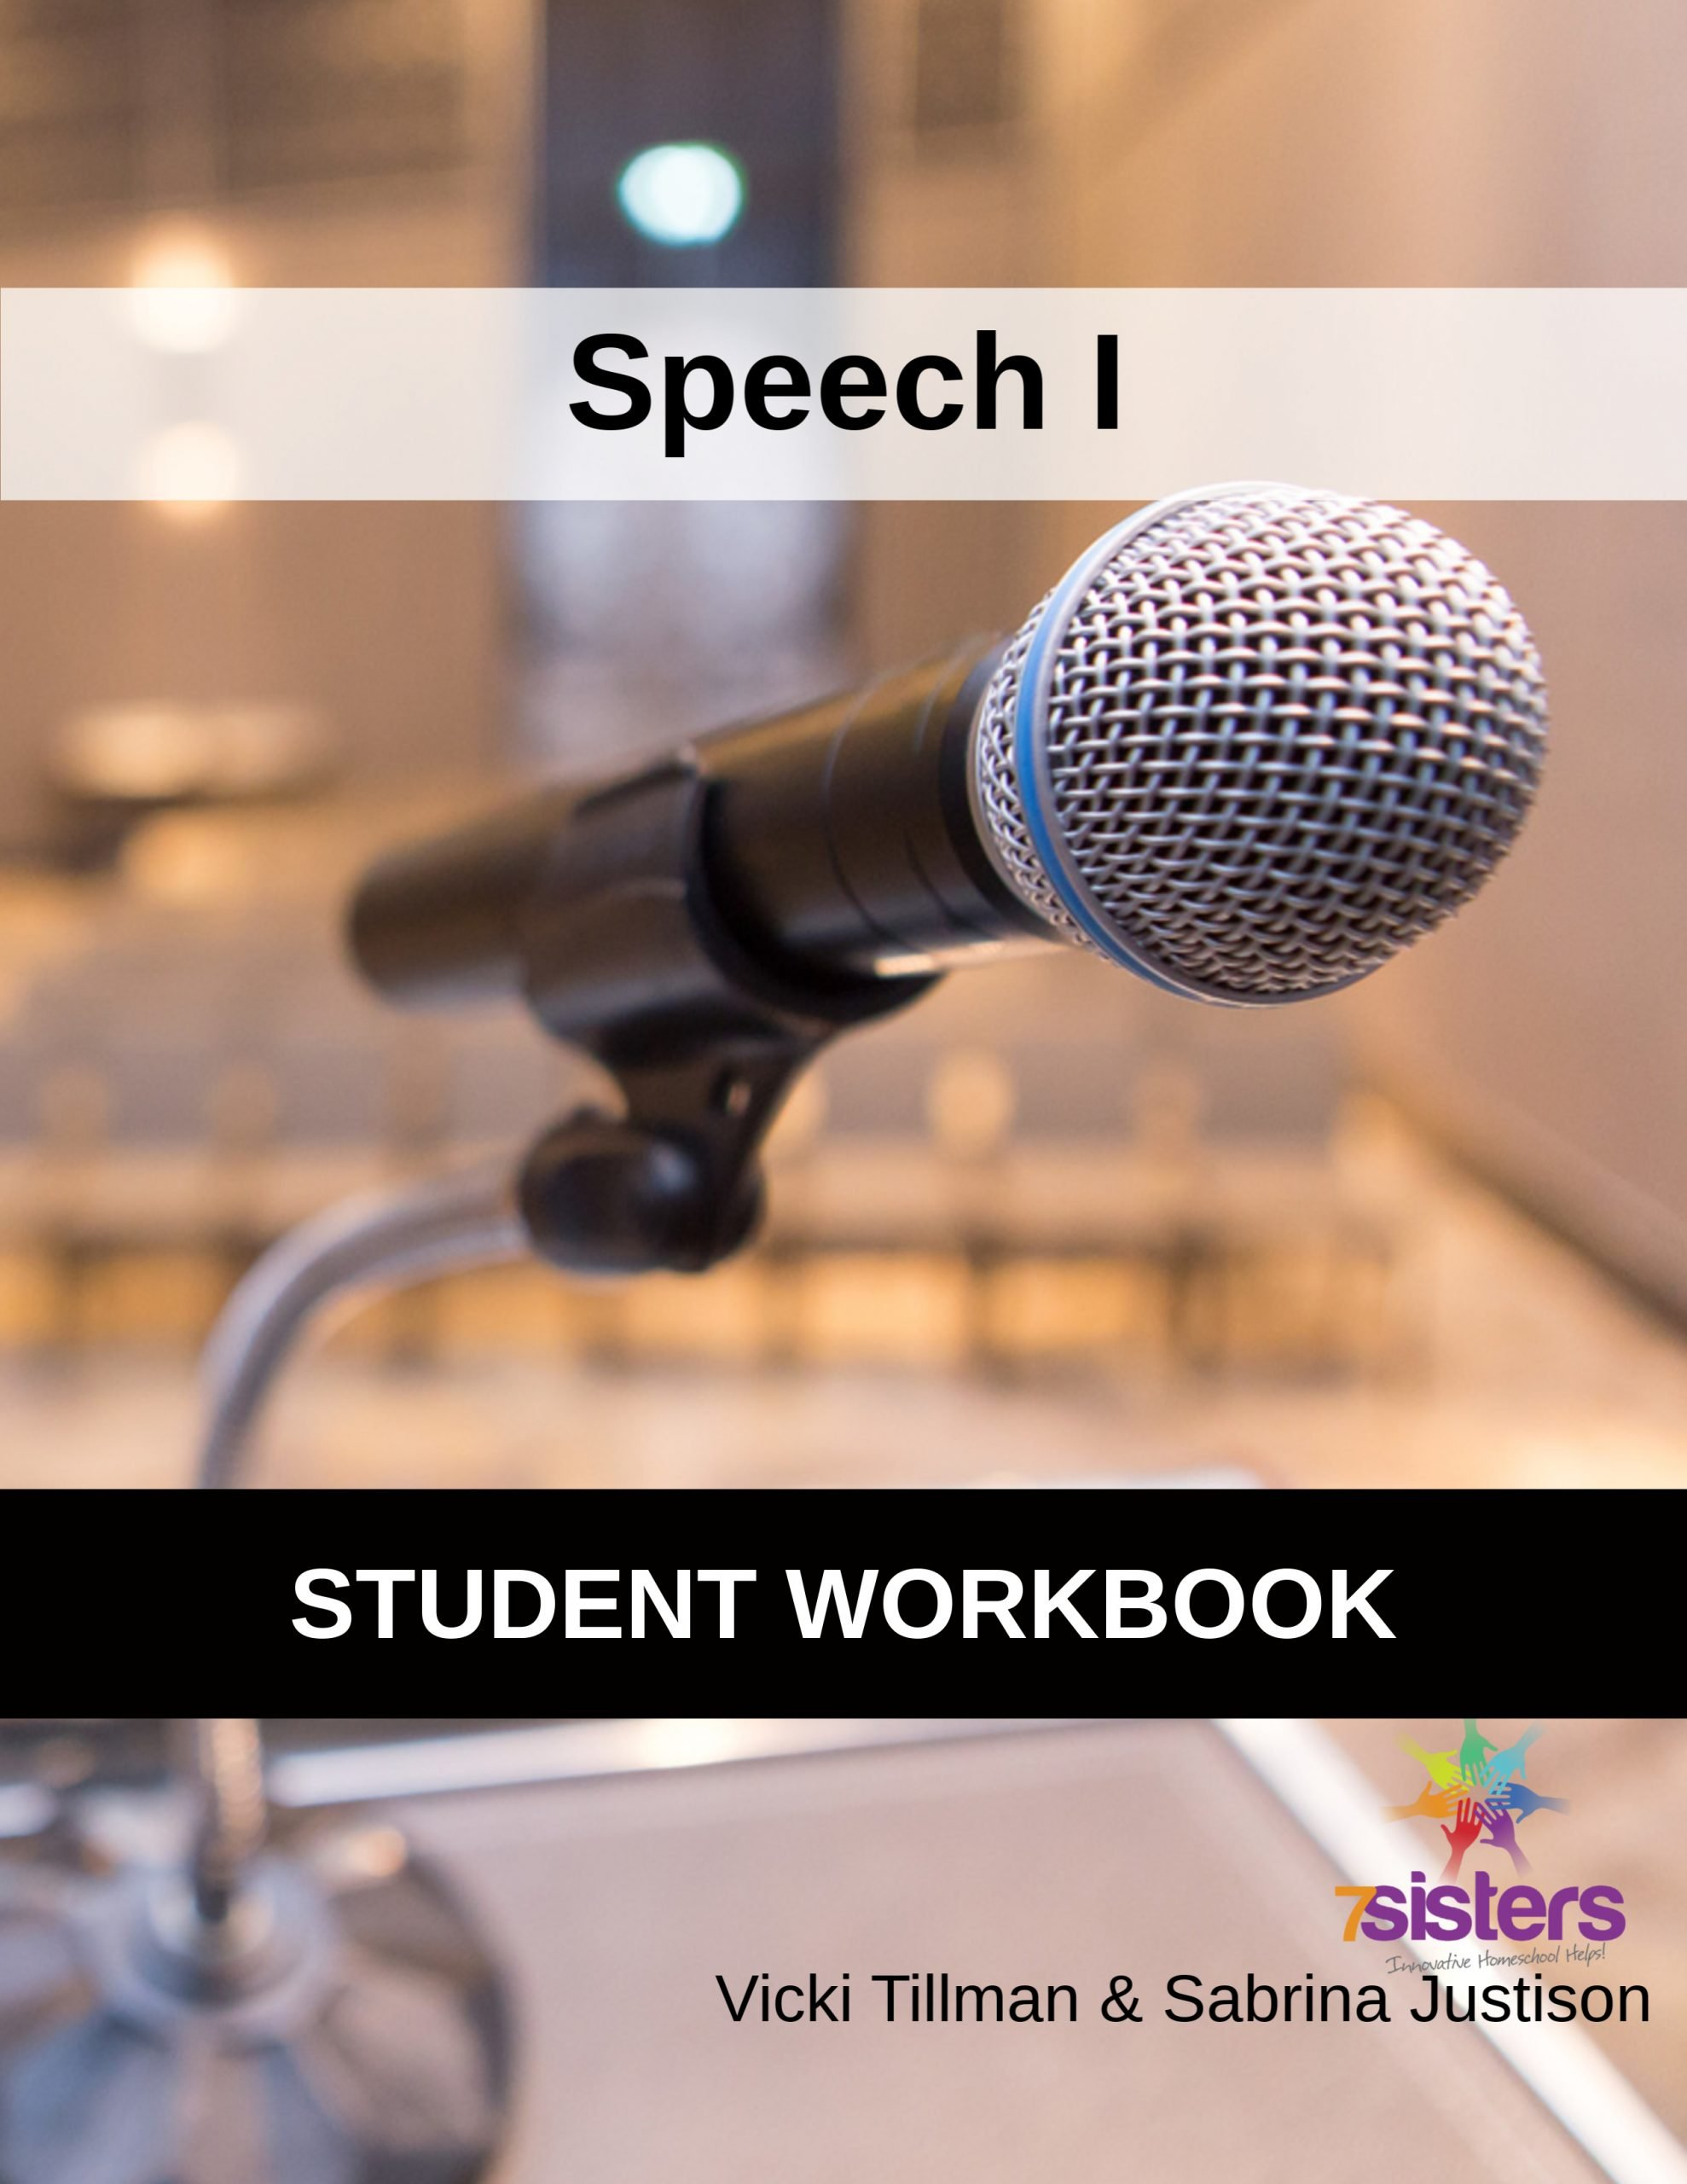 Speech I Student Workbook 7SistersHomeschool